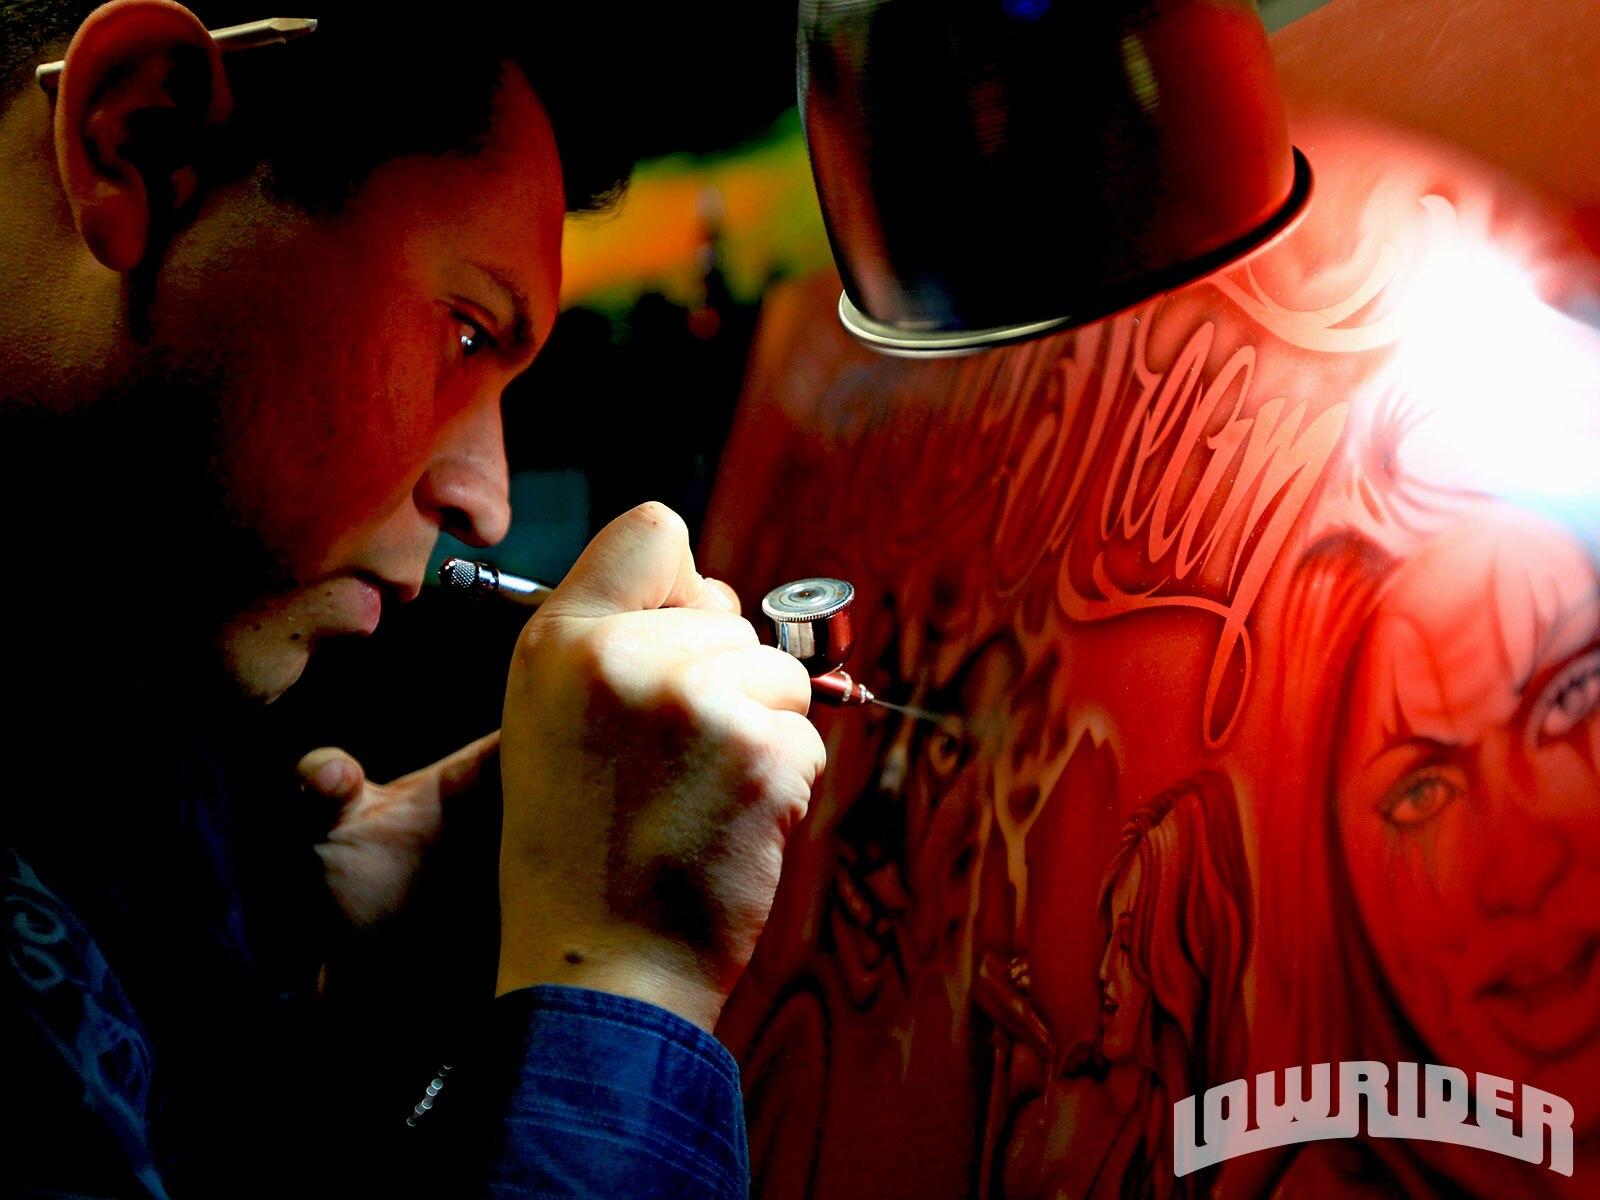 07-alberto-herrera-feature-artist-tattooing2